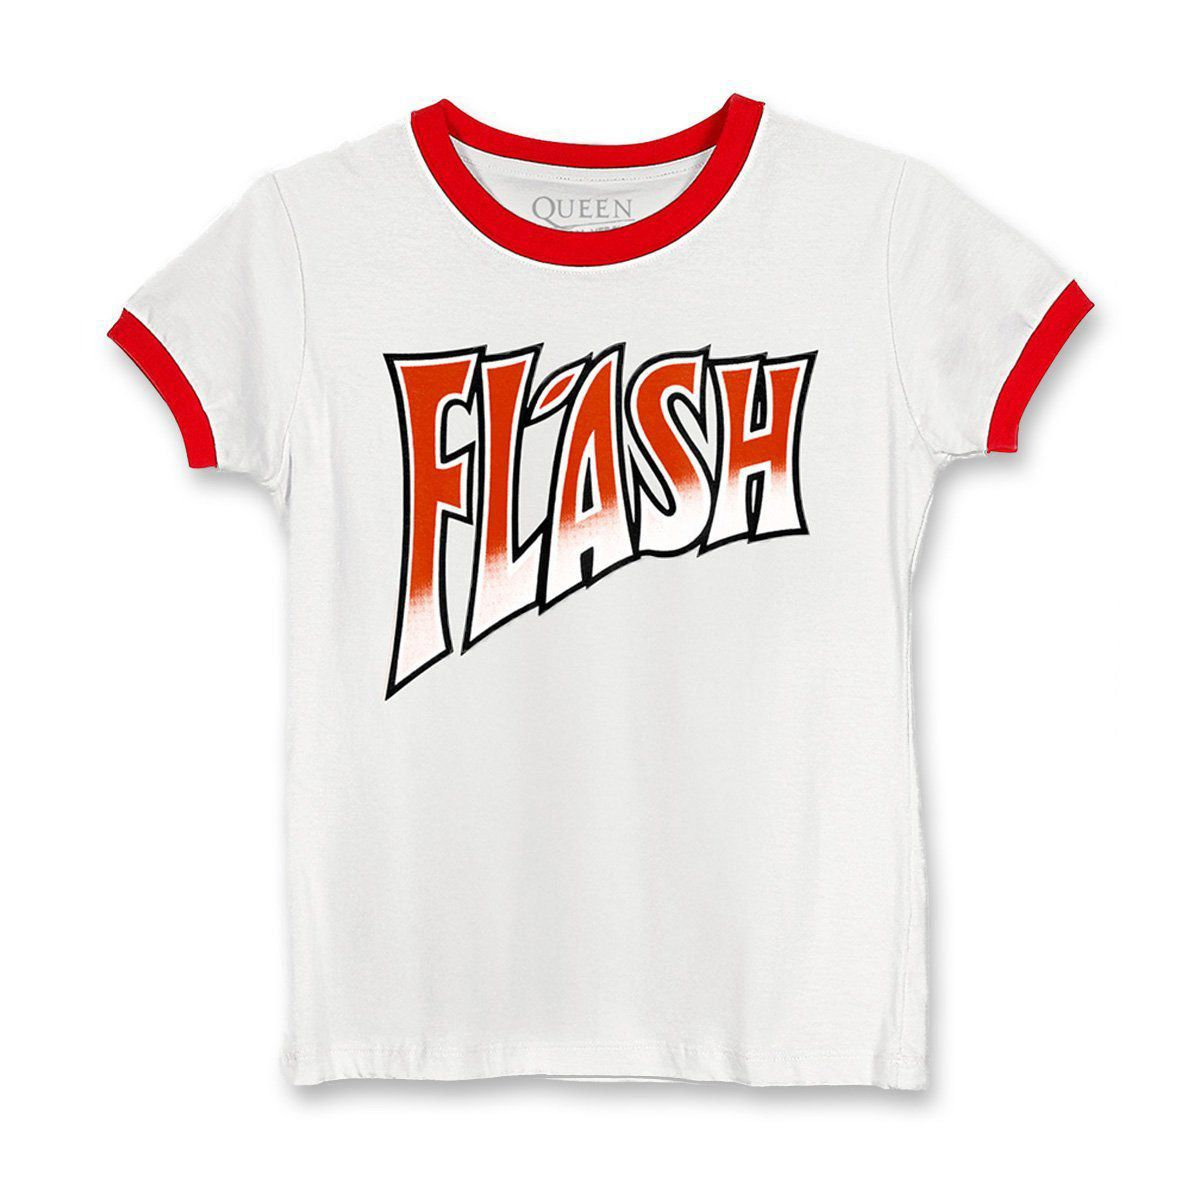 Camiseta Ringer Feminina Queen Flash  - bandUP Store Marketplace